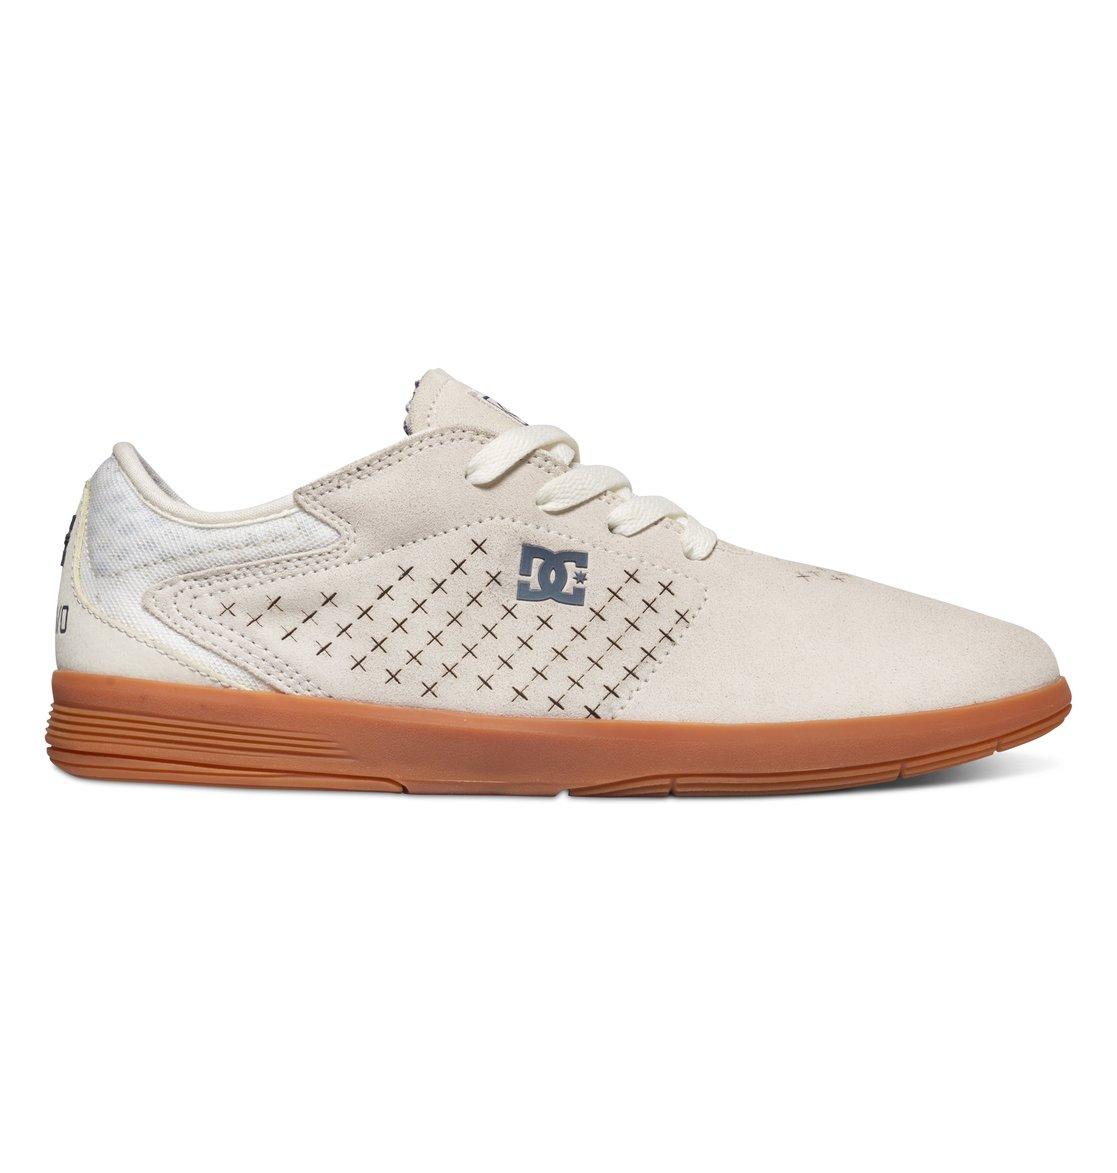 wide selection boy purchase genuine Men's New Jack S Felipe Skate Shoes